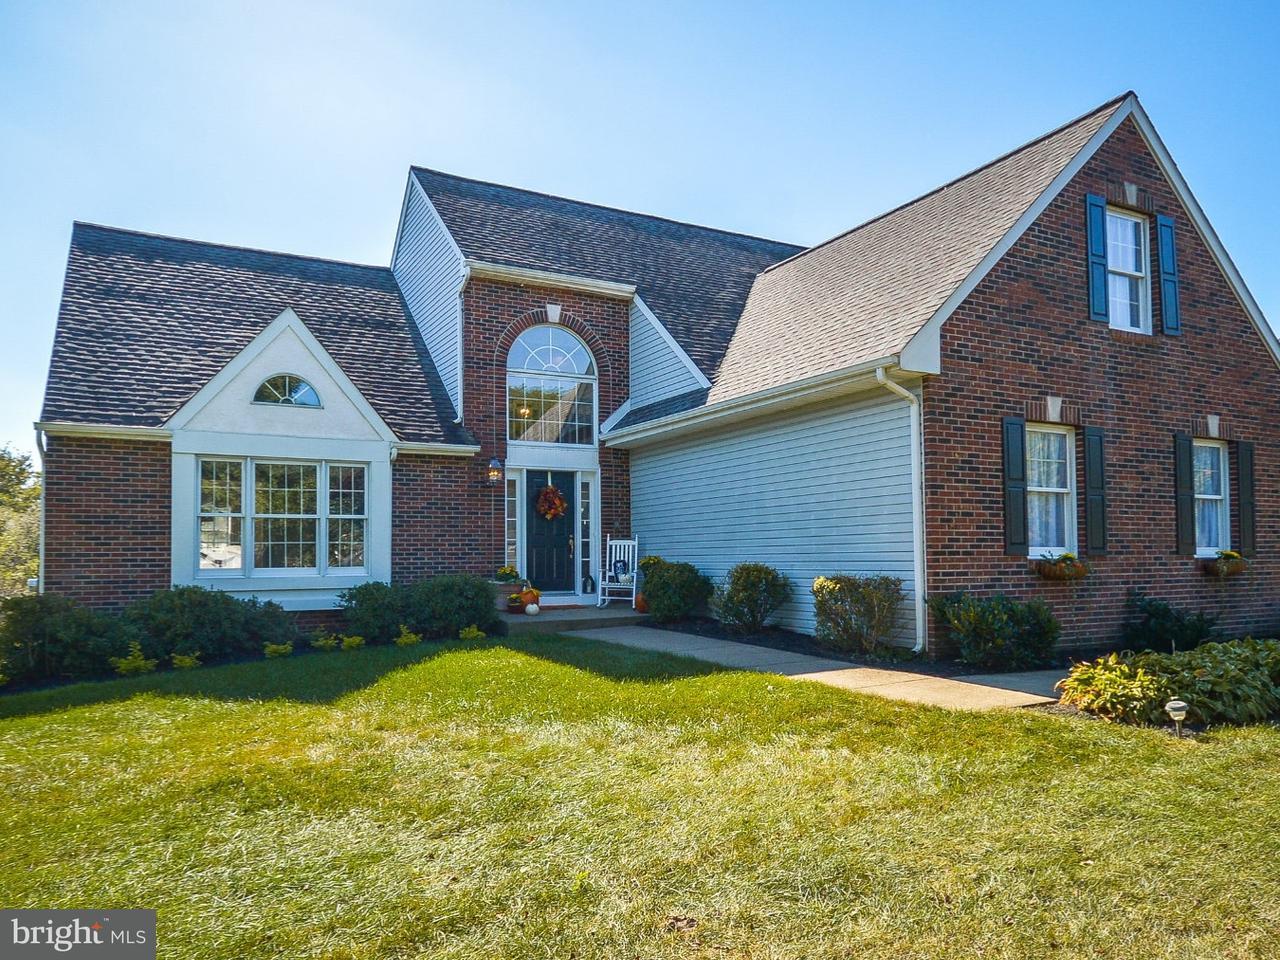 Single Family Home for Sale at 111 TAMARACK Circle Hatboro, Pennsylvania 19040 United States